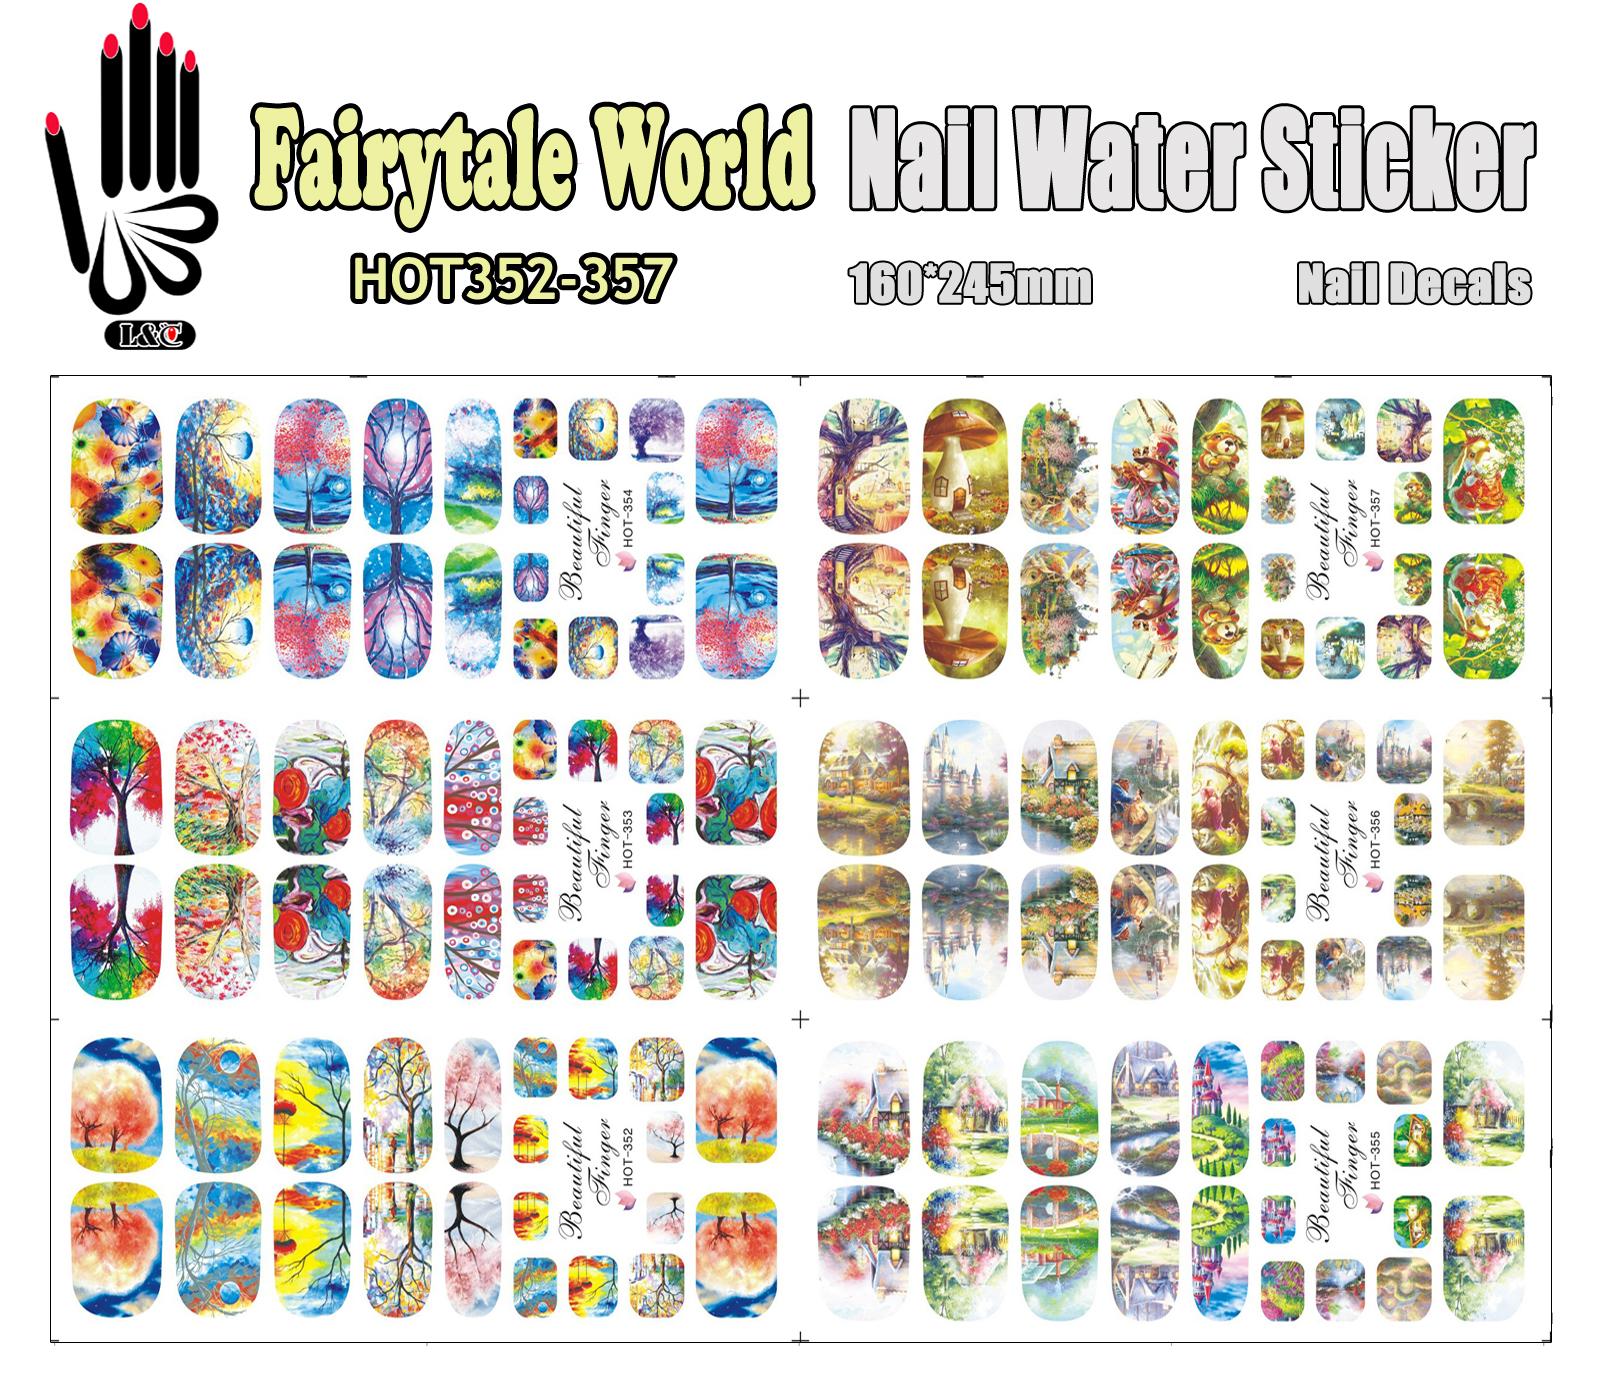 6 Sheets/Lot Art Nail HOT352-357 Fairytale World Full Cover Nail Film Nail Art Water Sticker Decal For Nail Art (6 DESIGNS IN 1)(China (Mainland))